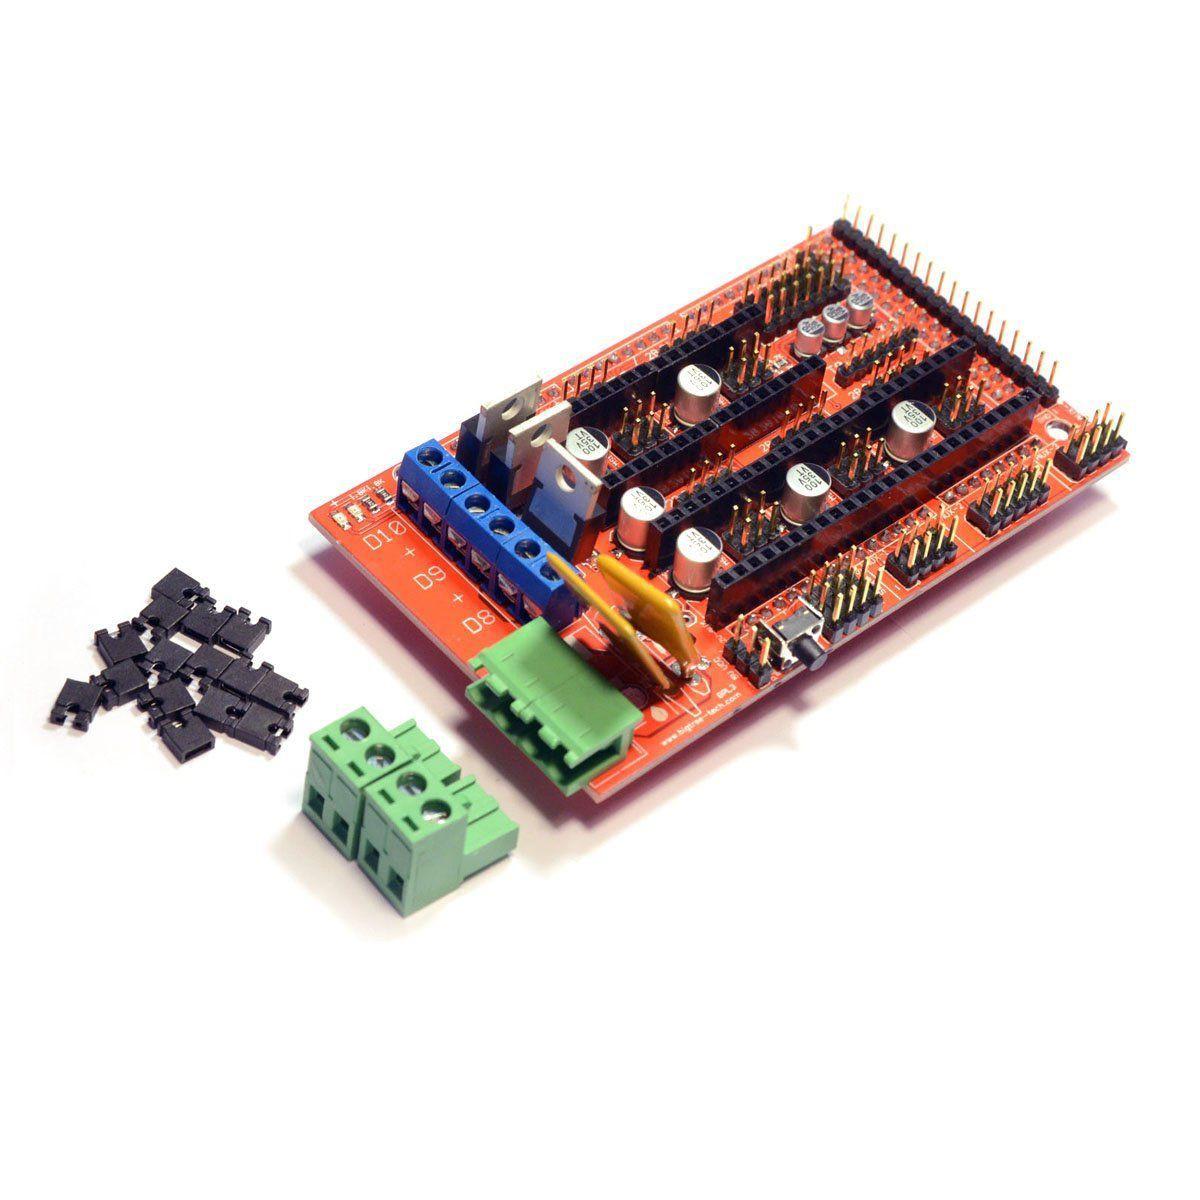 Ramps version 1.4 Compatible Arduino Mega 2560